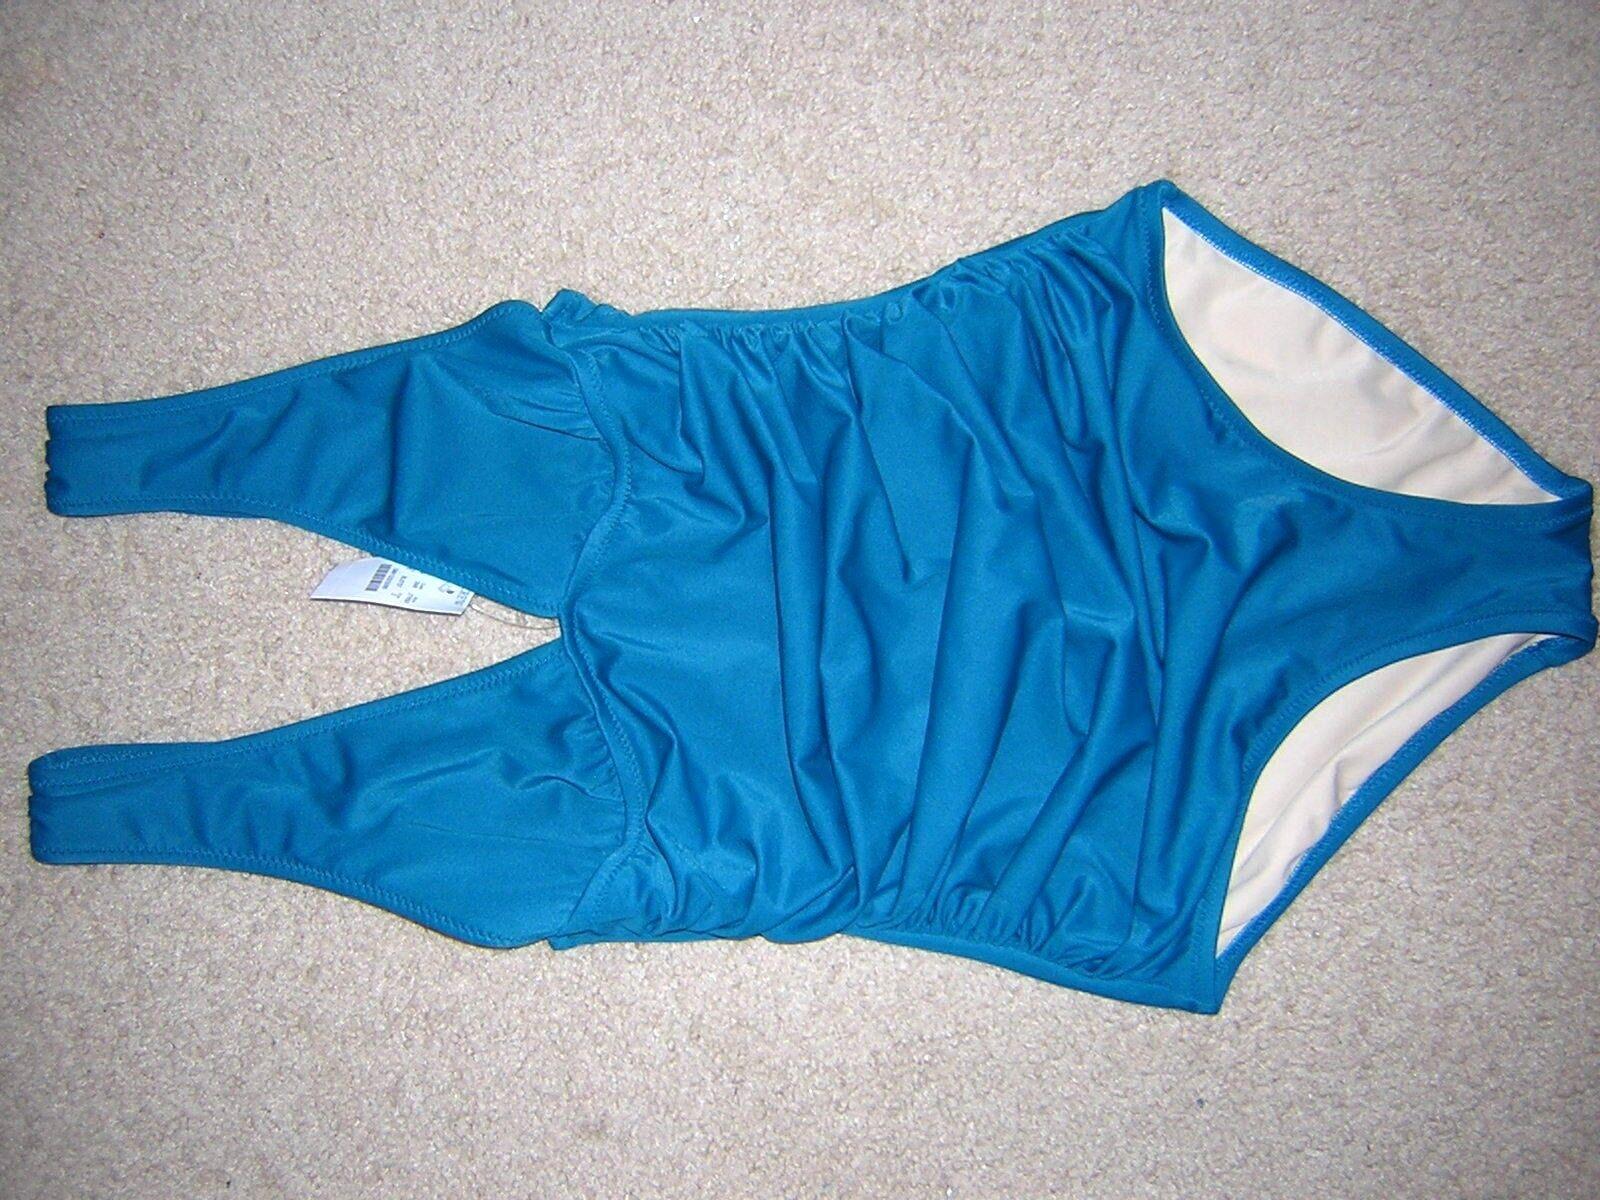 NEW  J. CREW One Piece Swimsuits Size 2  color Petroleum